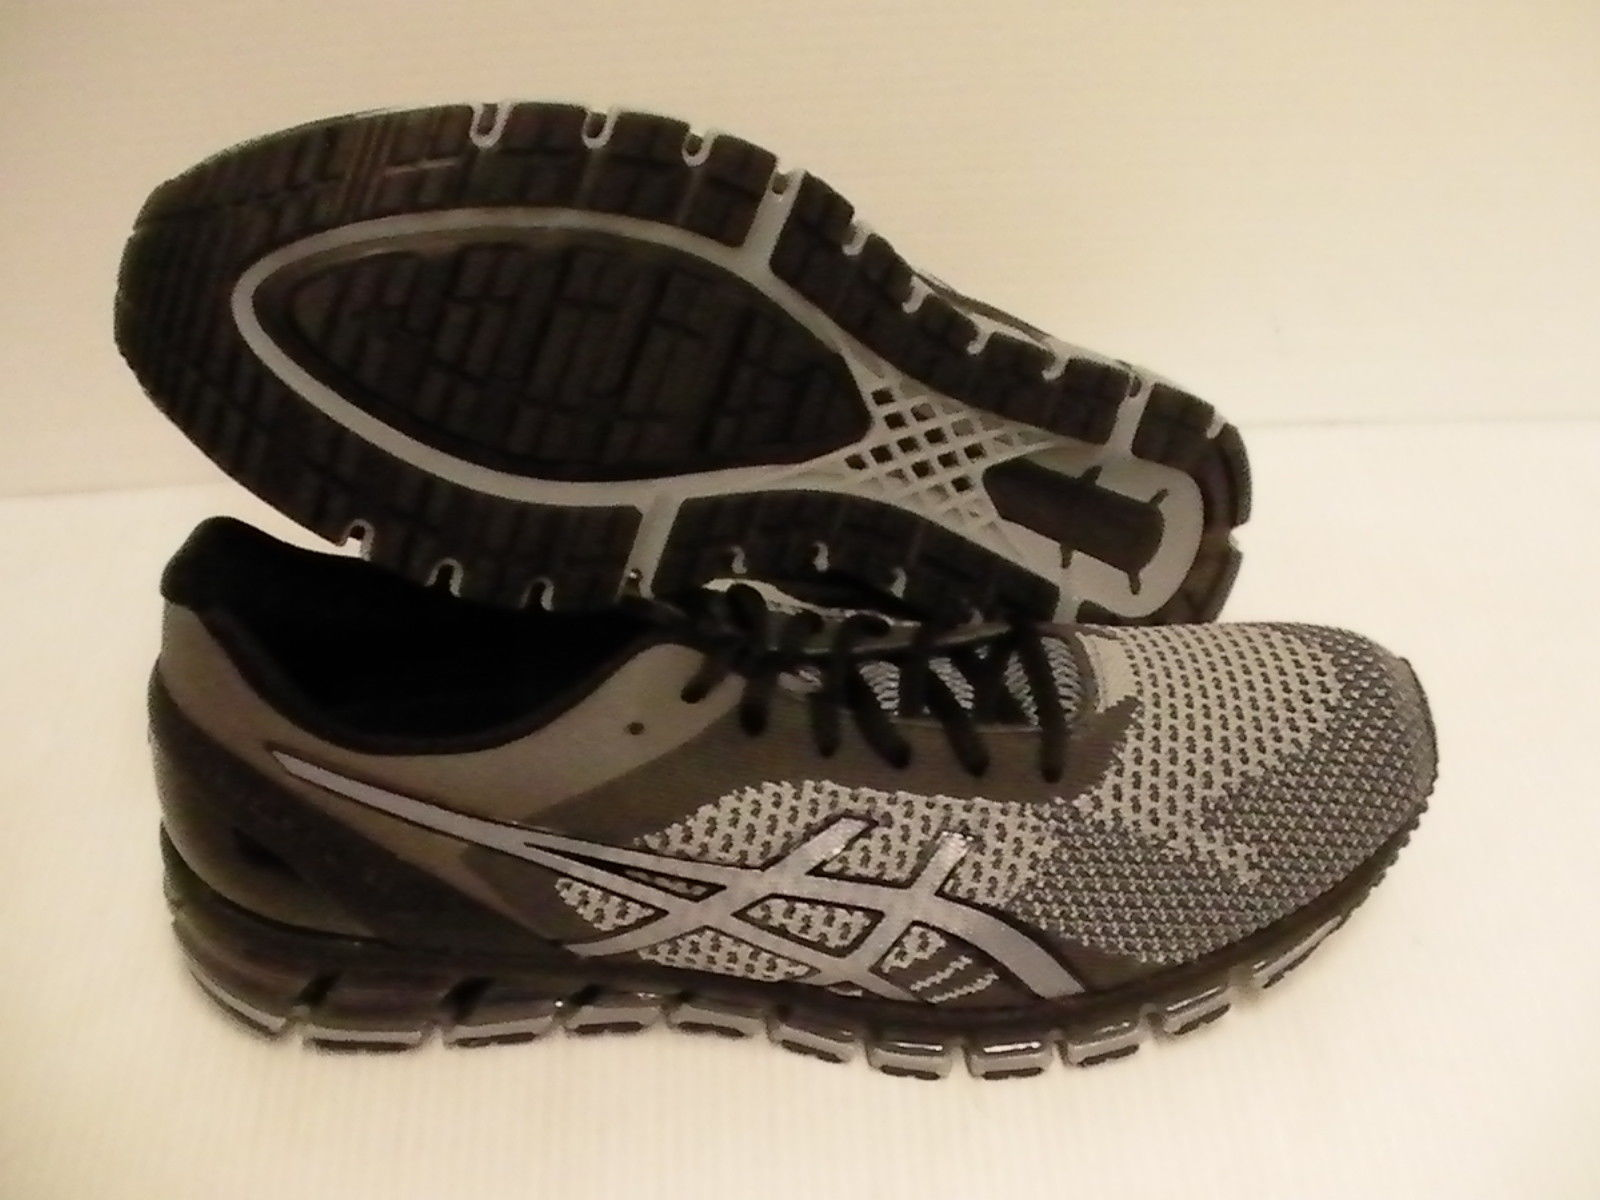 separation shoes 622db 241e1 57. 57. Asics men s gel quantum 360 knit running shoes mid grey carbon black  size 13 us. Asics men s gel ...